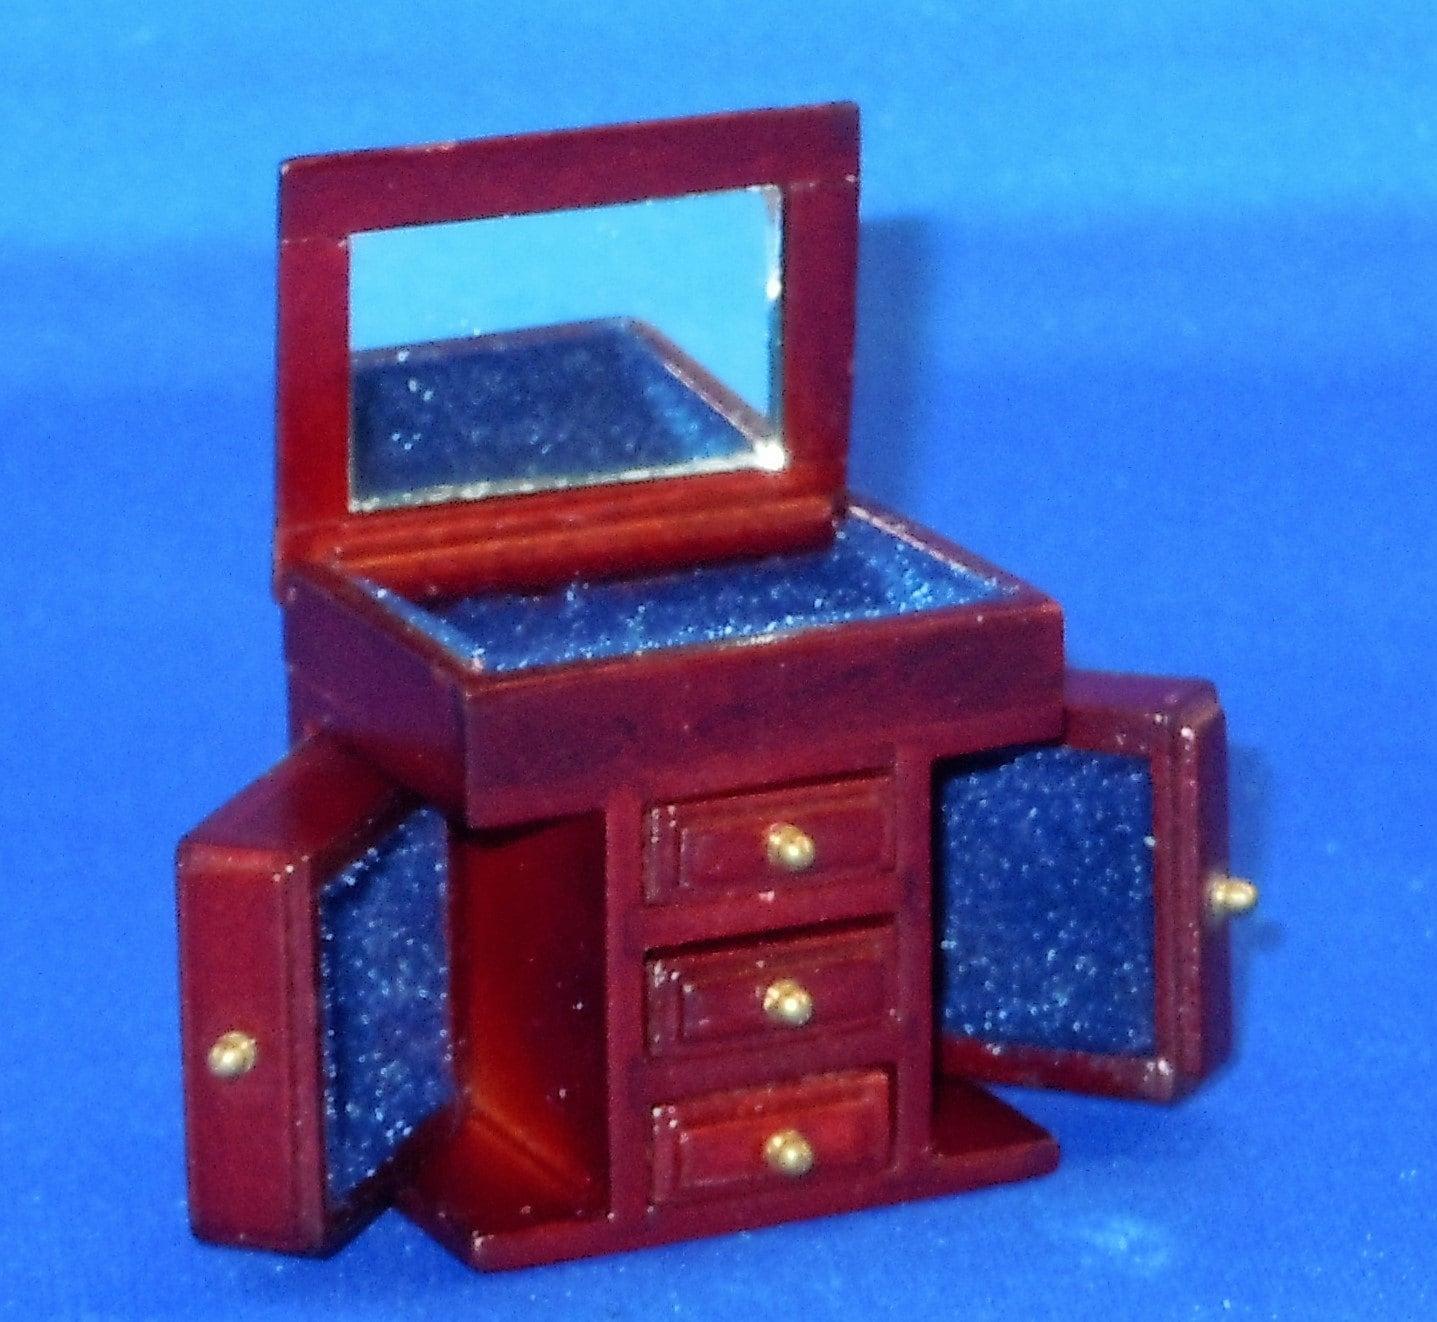 Dollhouse Miniature Accessory Jewelry Chest By Heidi Ott